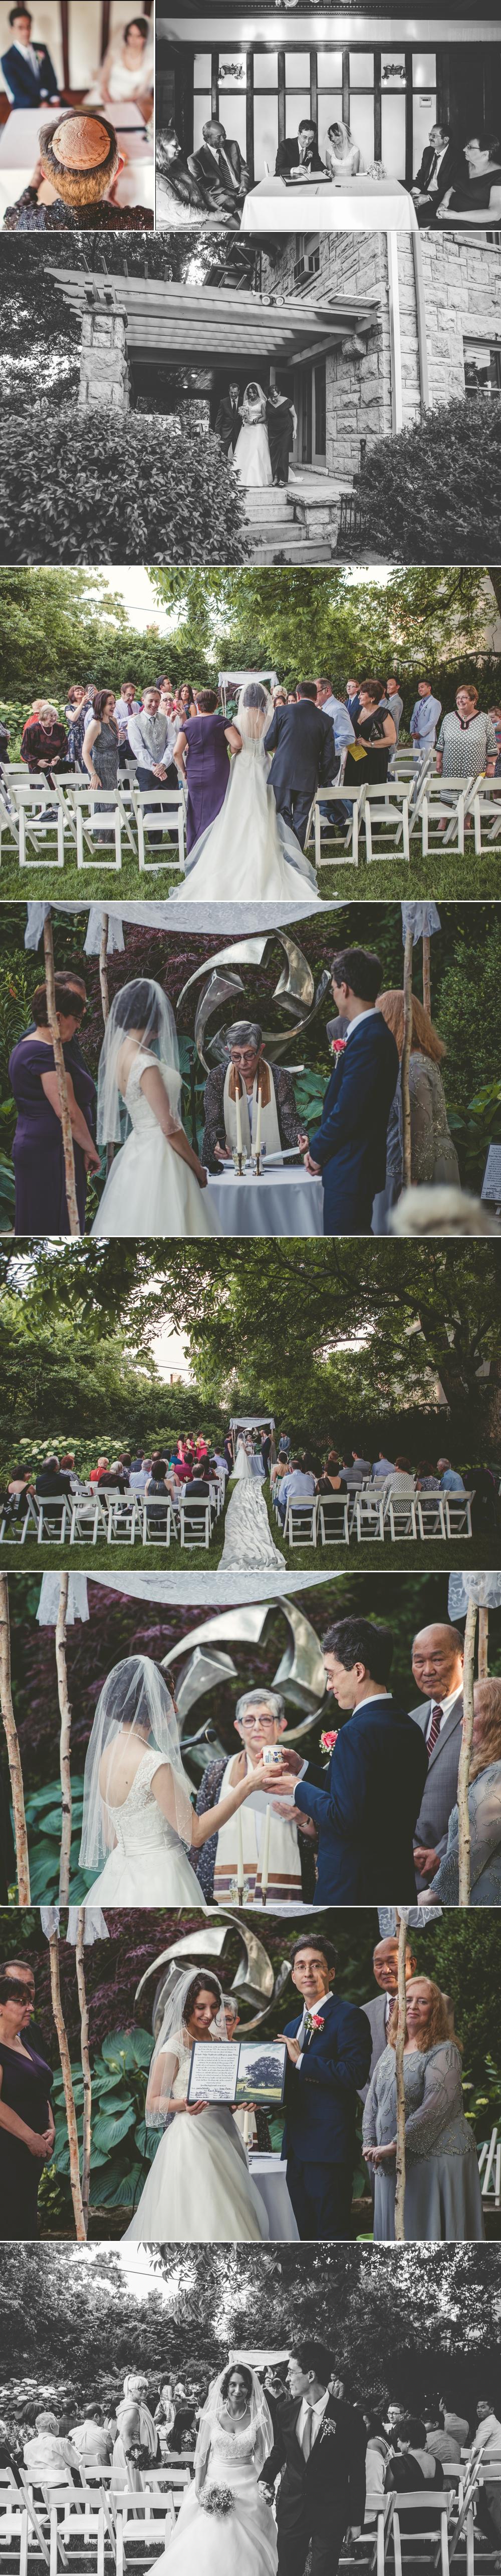 jason_domingues_photography_best_kansas_city_photographer_kc_weddings_simpson_house_0002